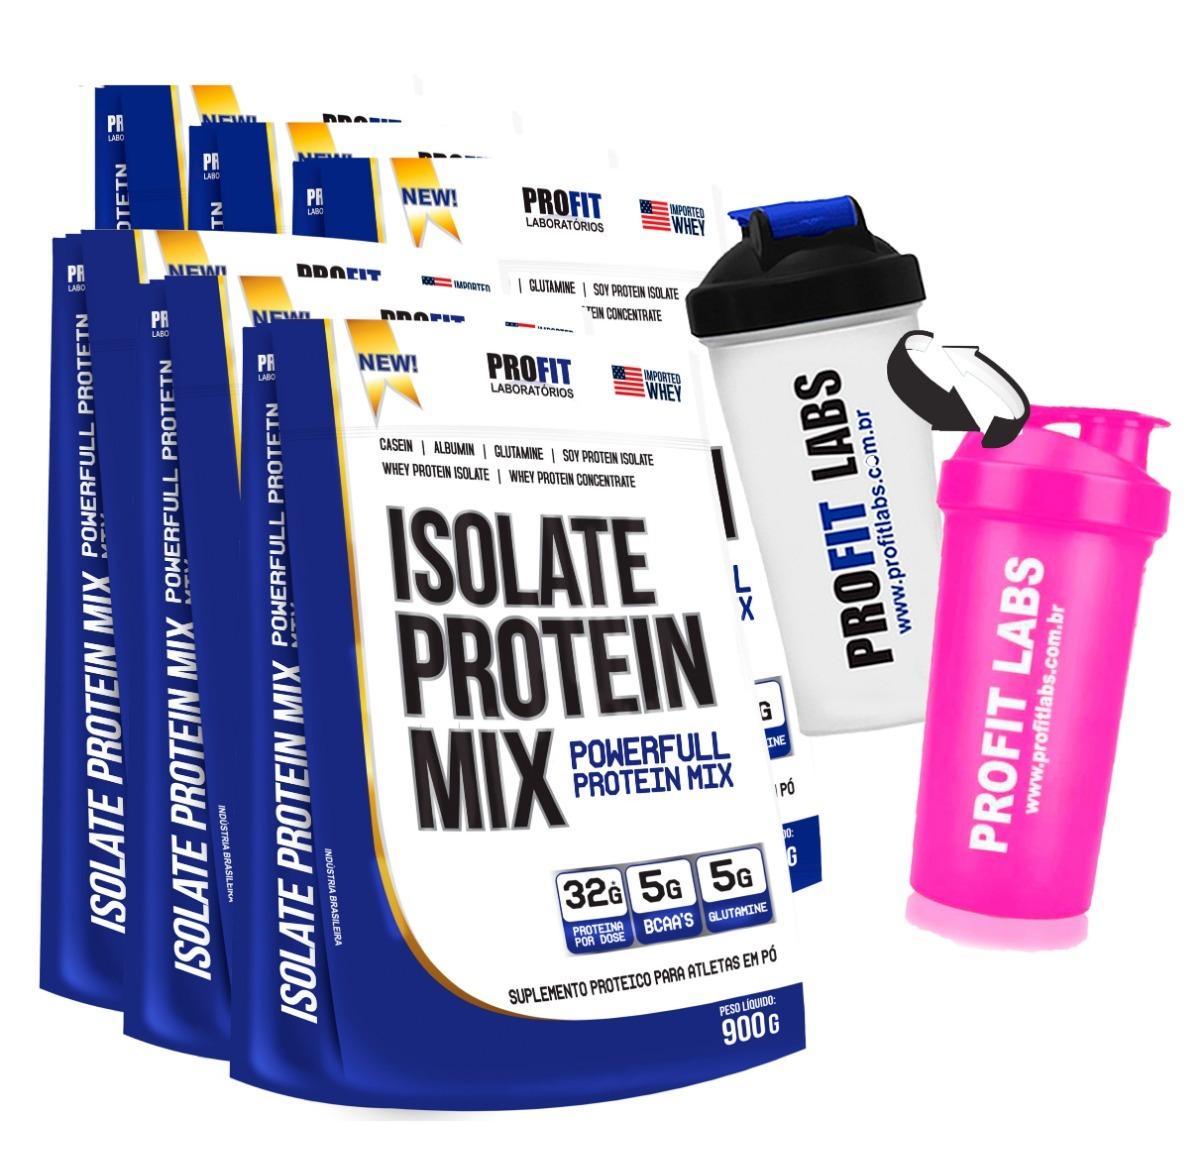 9d6ff4bbf kit 6 whey protein isolado mix refil 900g + brinde - profit. Carregando zoom .